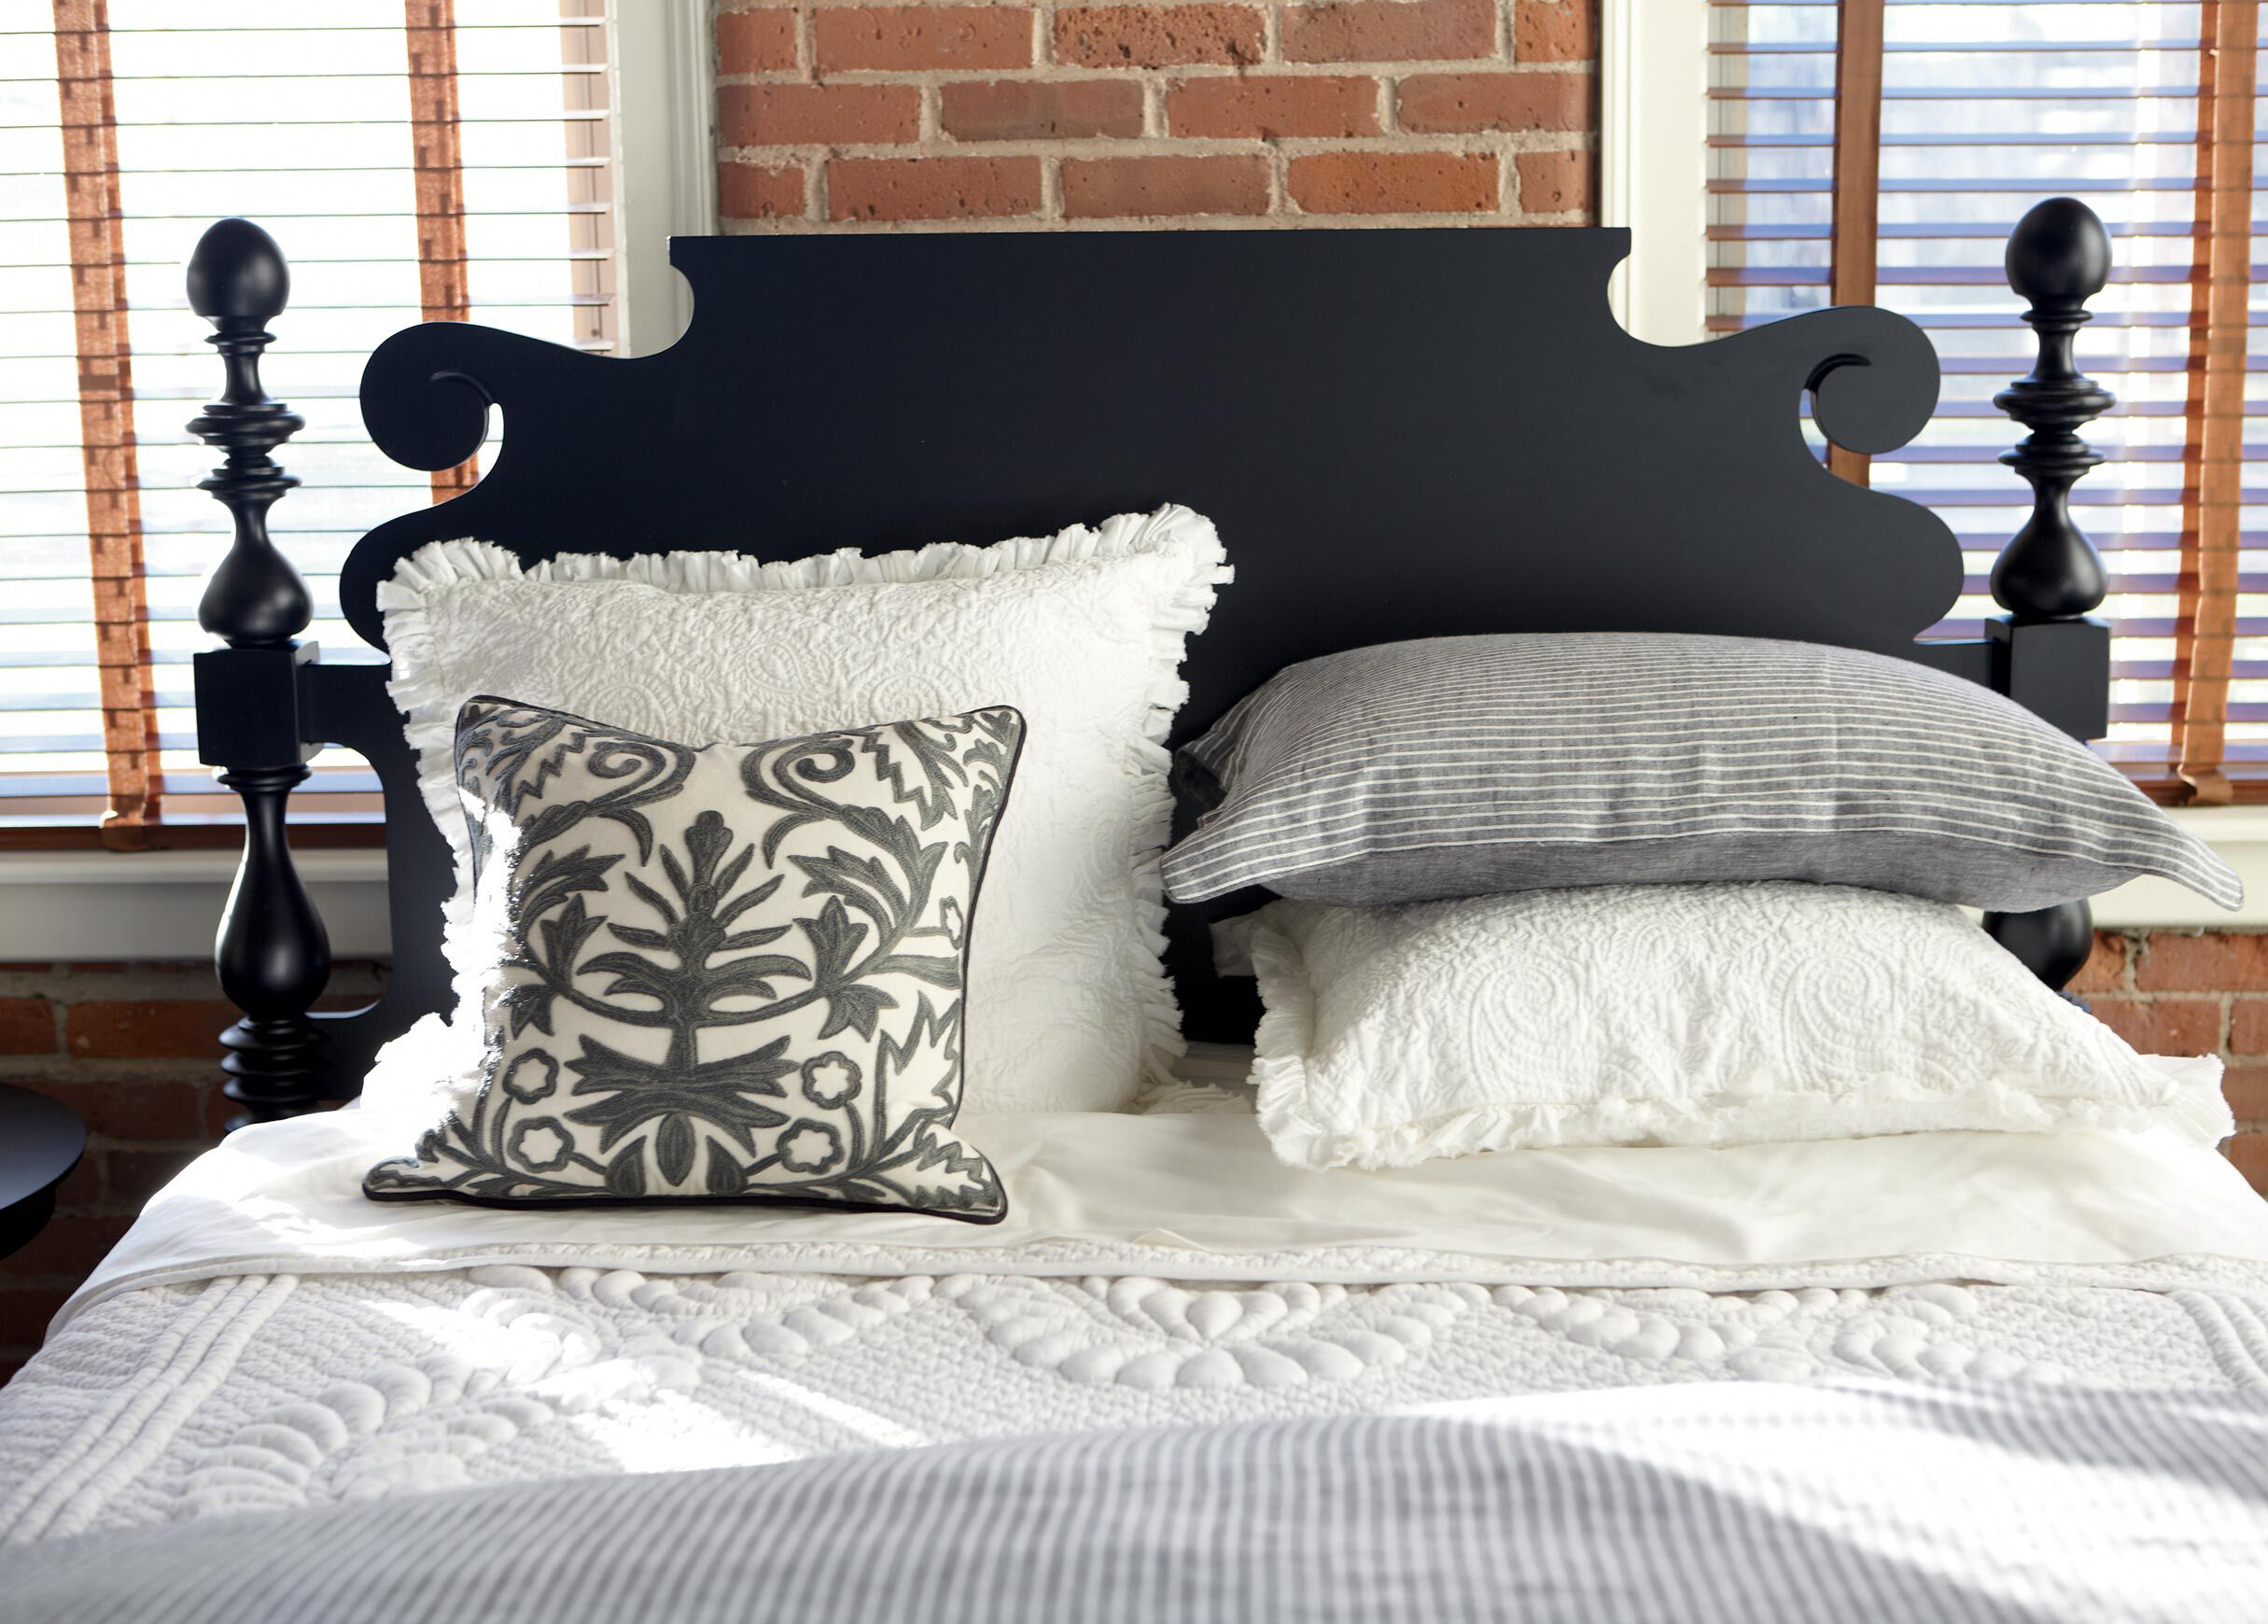 distributor formal blue pillows oxford izod of plaid trellis pinstripe max linens pillow wholesale